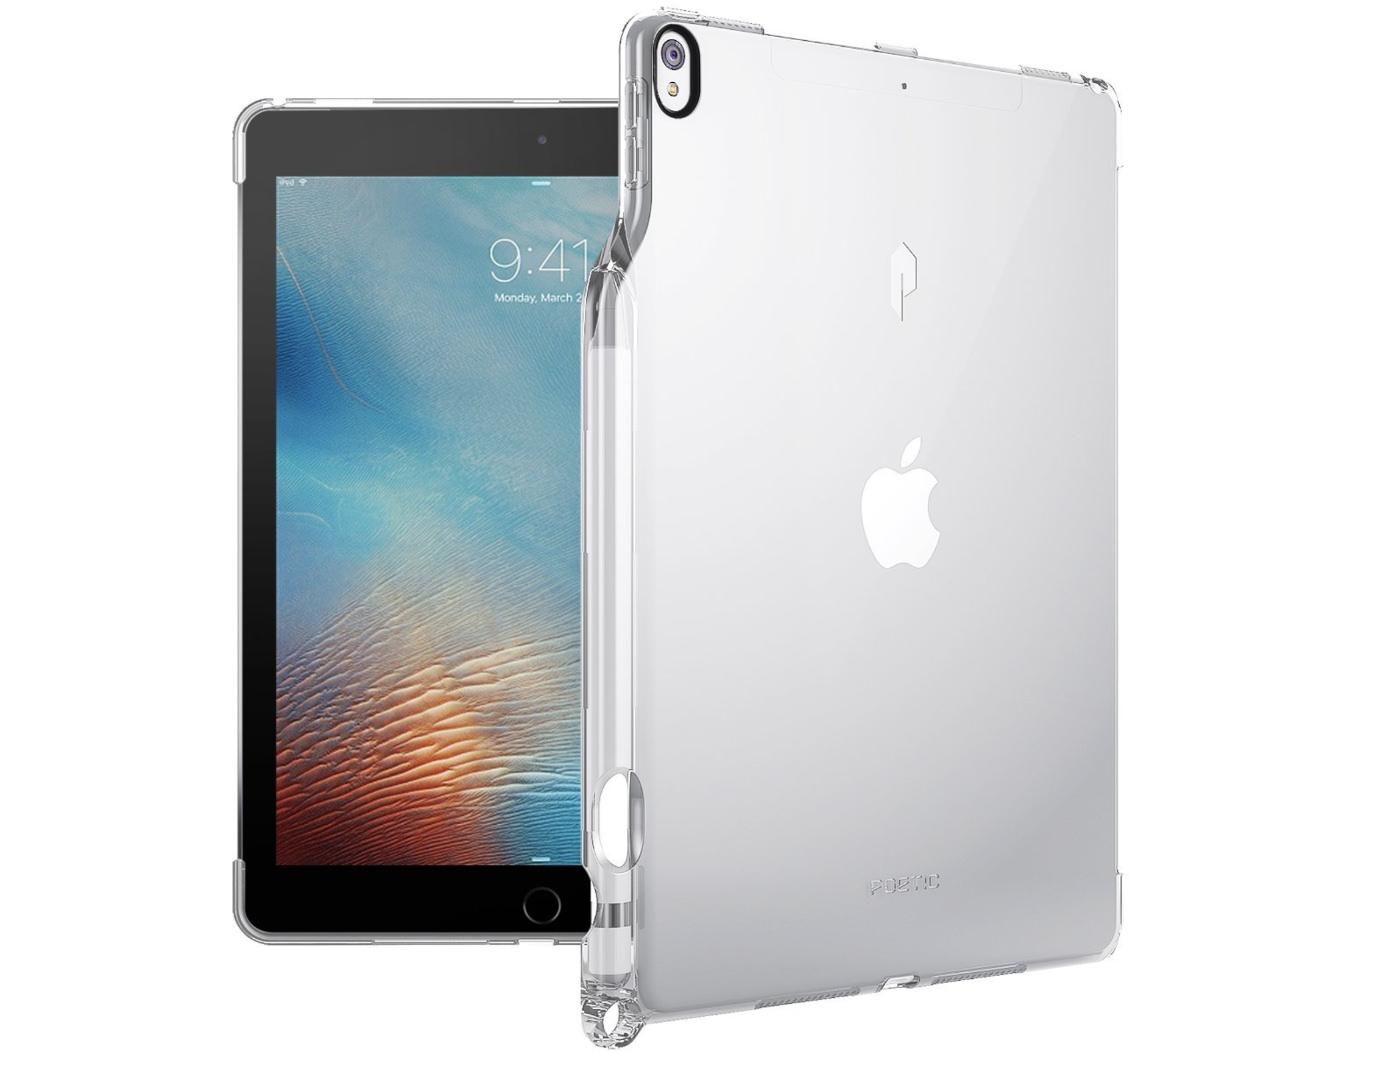 [iPad Pro]「Apple Pencil」収納スロット&「Smart Keyboard」対応iPad Pro 10.5 TPU製ケースが届いたので早速装着してみたよ